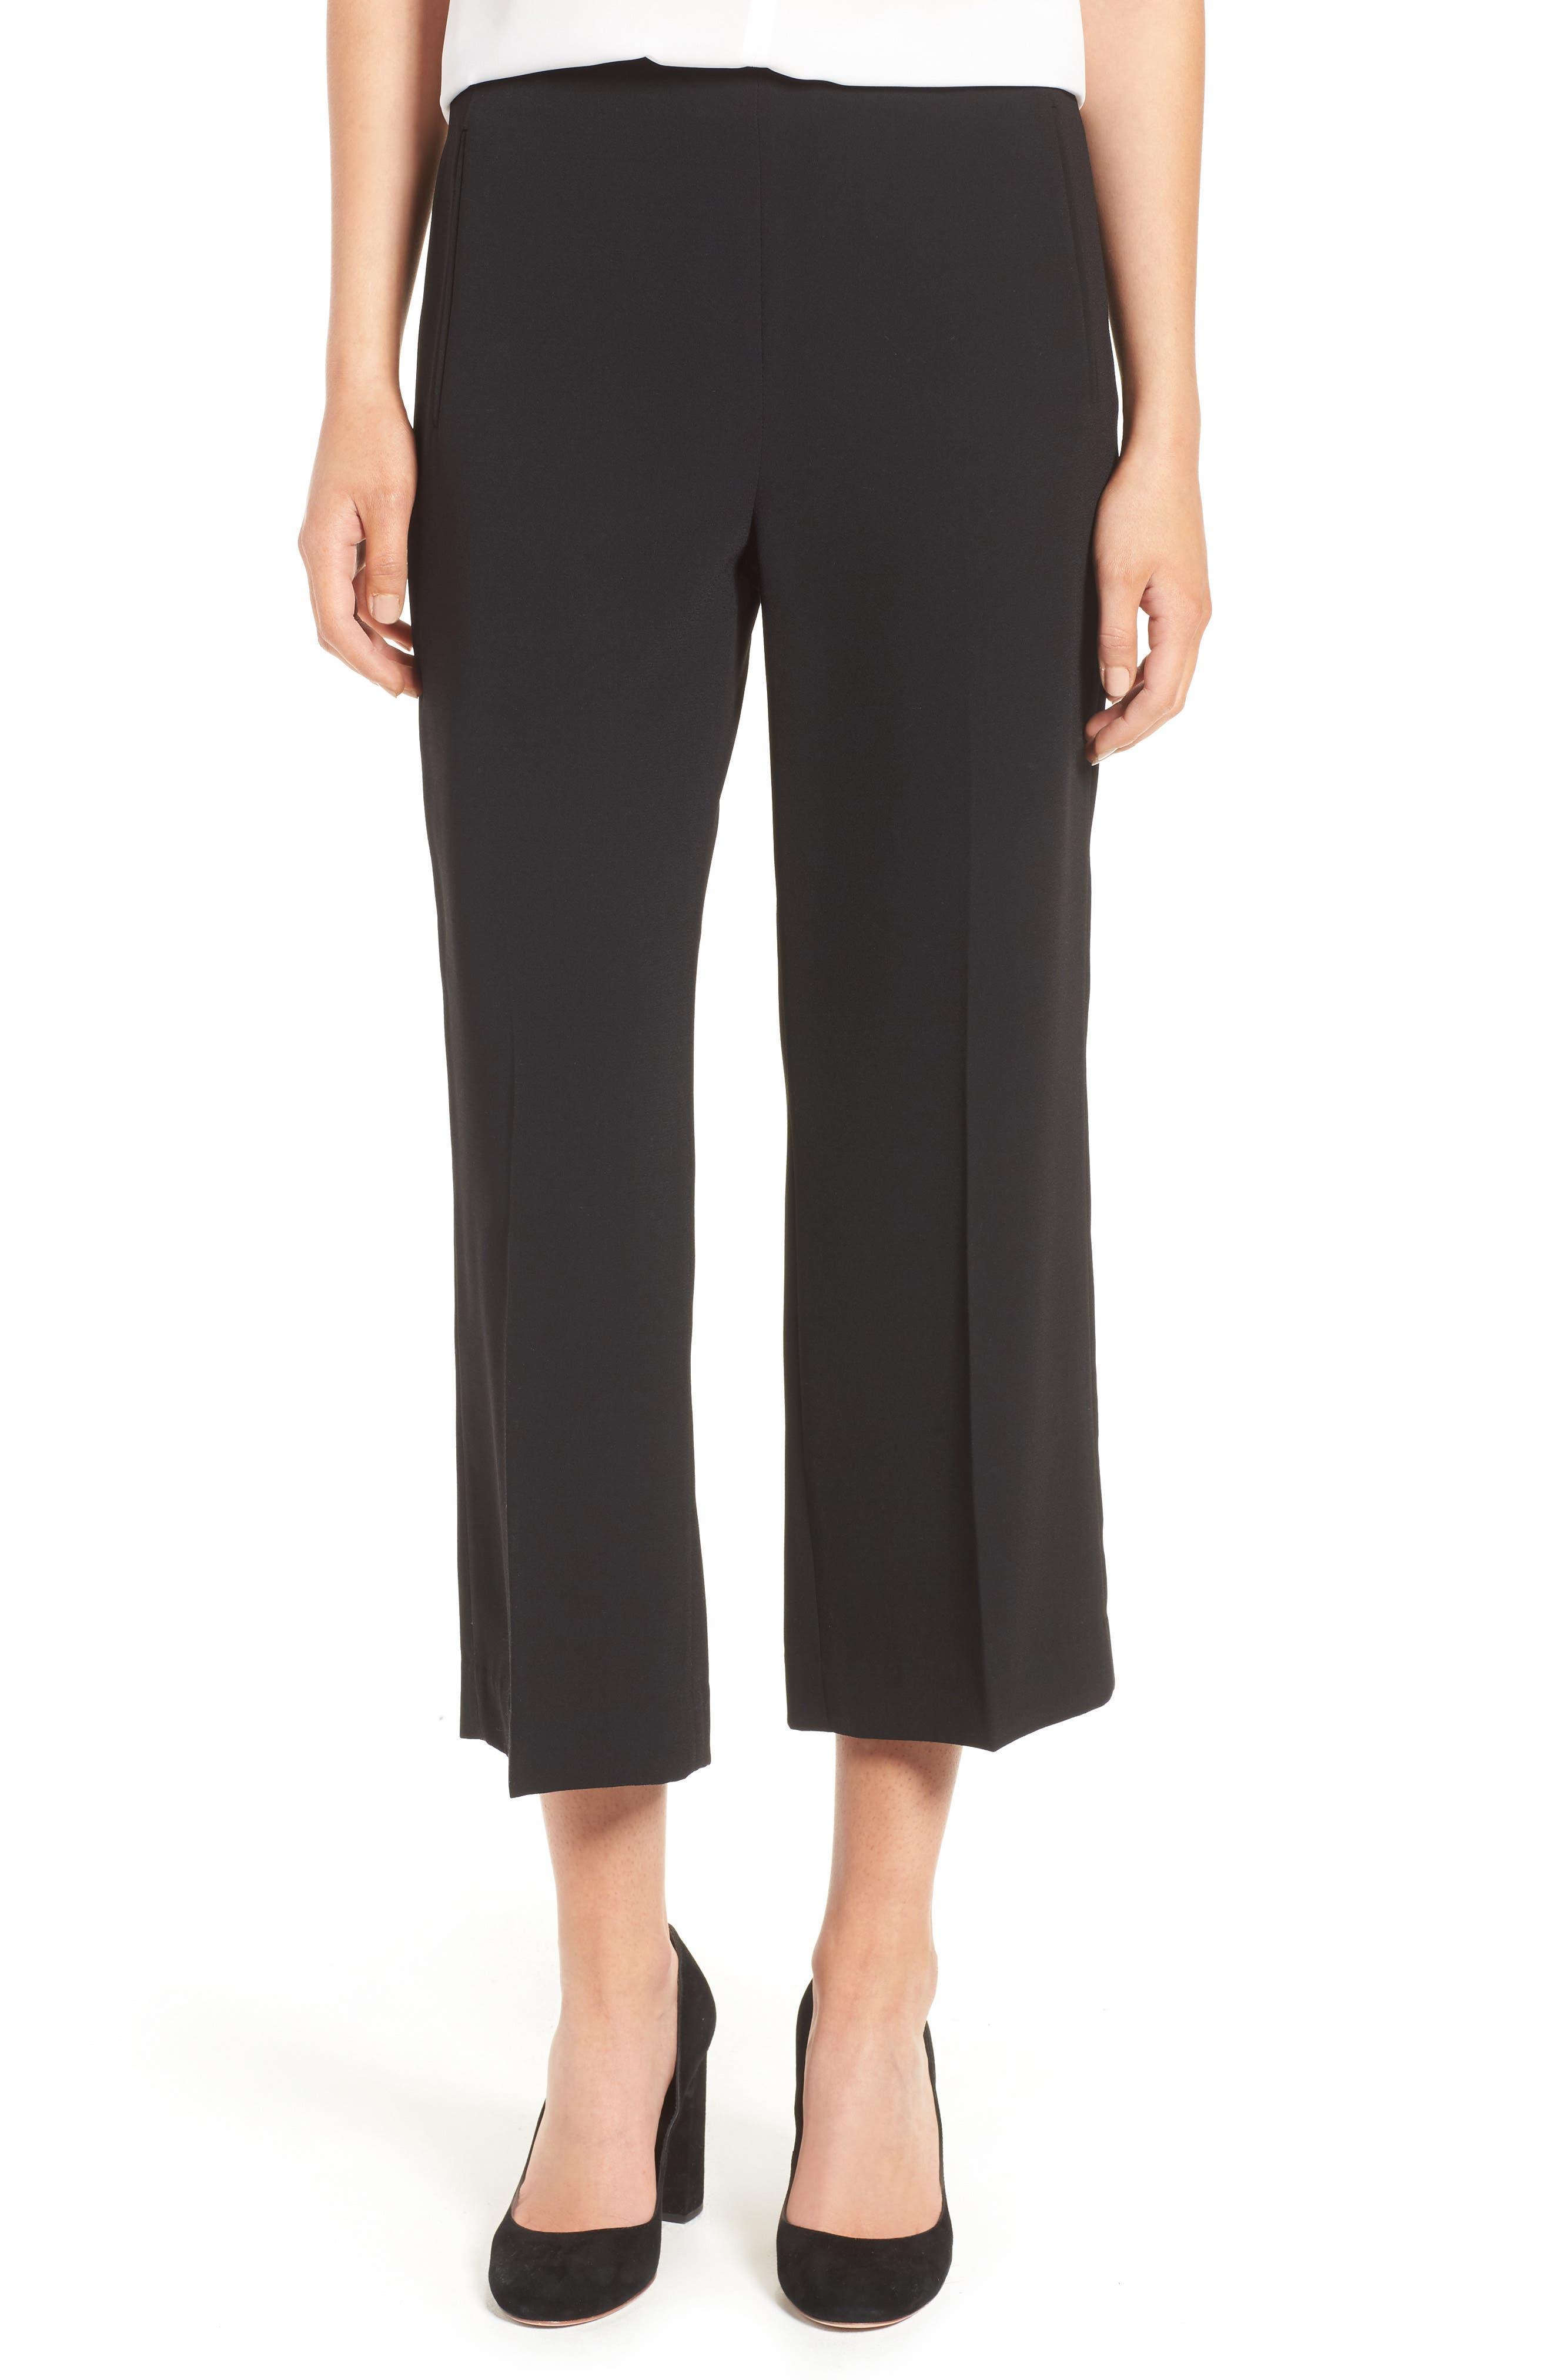 Moss Crepe Crop Trousers,                             Main thumbnail 1, color,                             Black